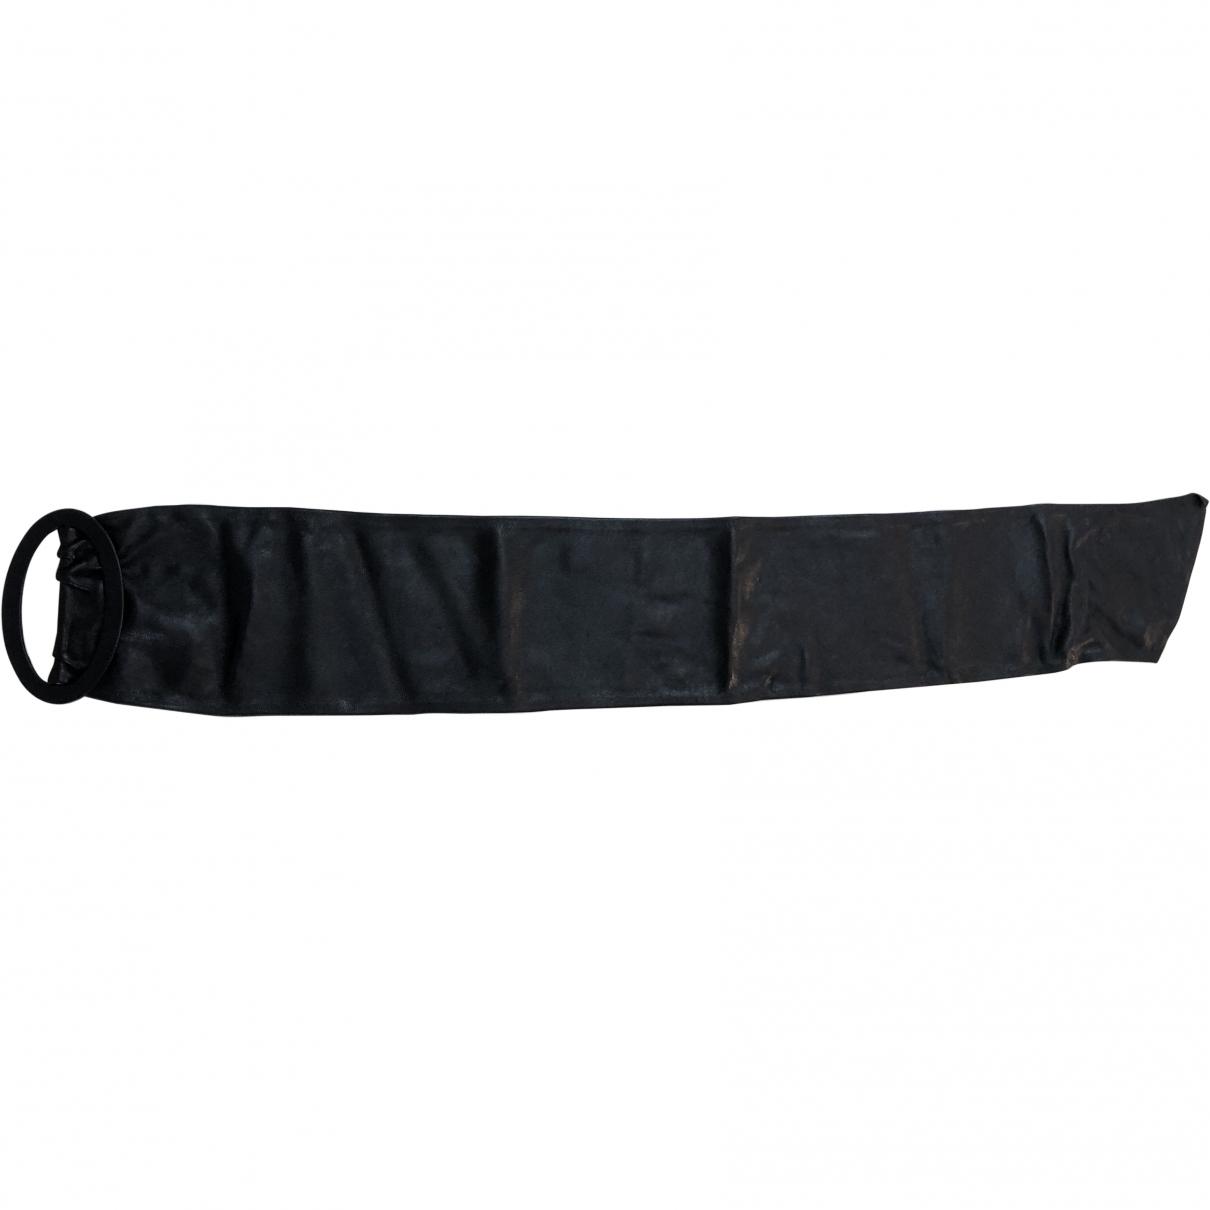 Anna Molinari \N Black Leather belt for Women 85 cm